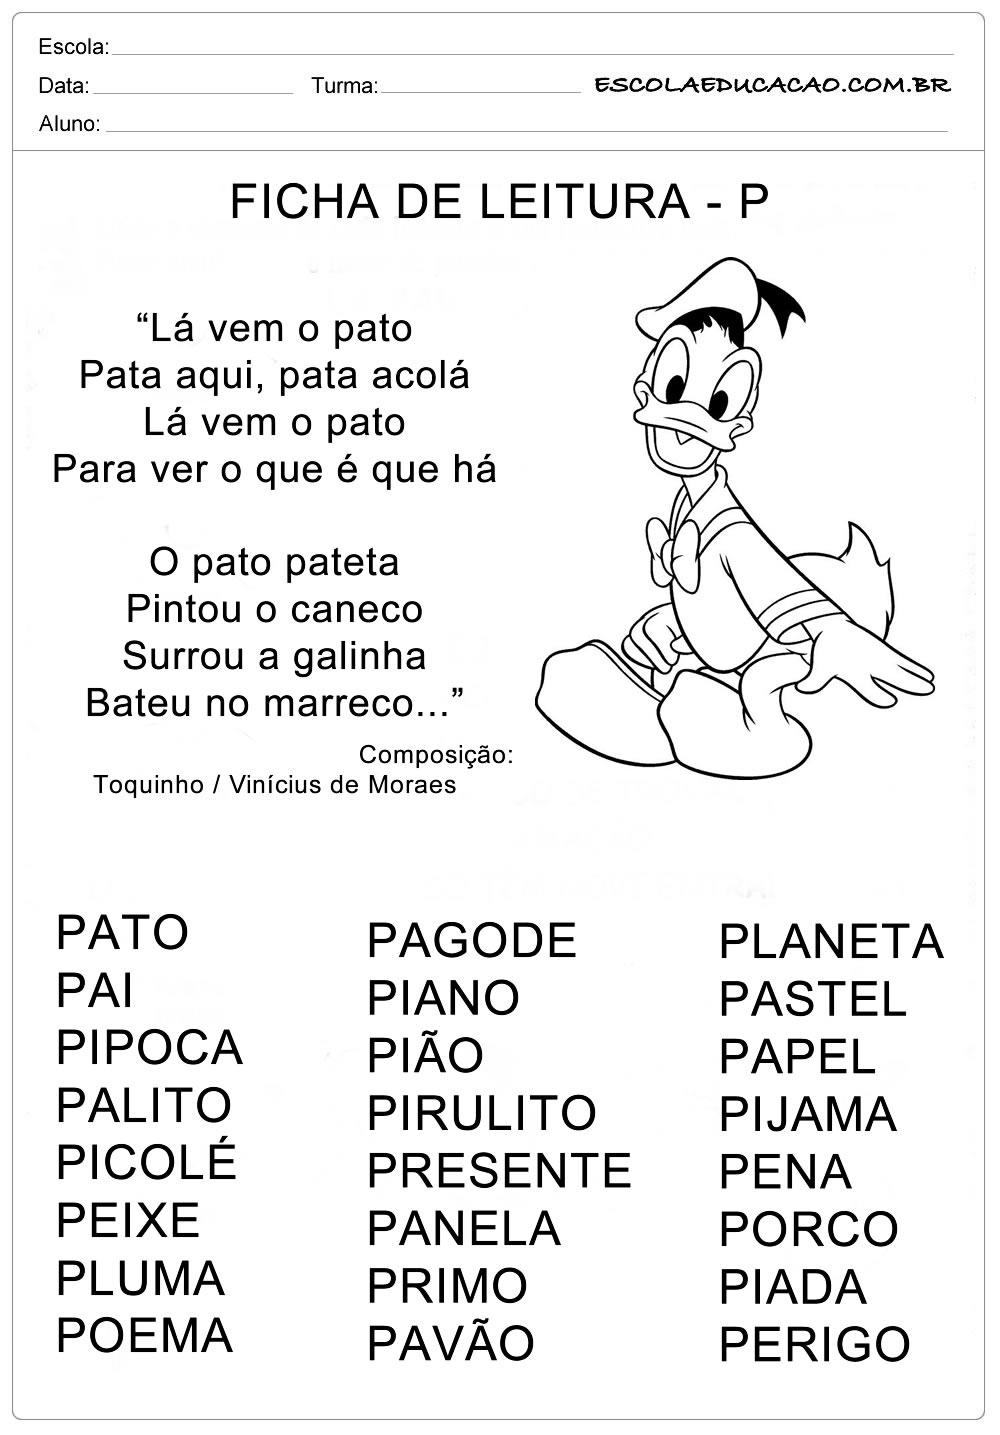 Ficha de Leitura Letra P – Pato